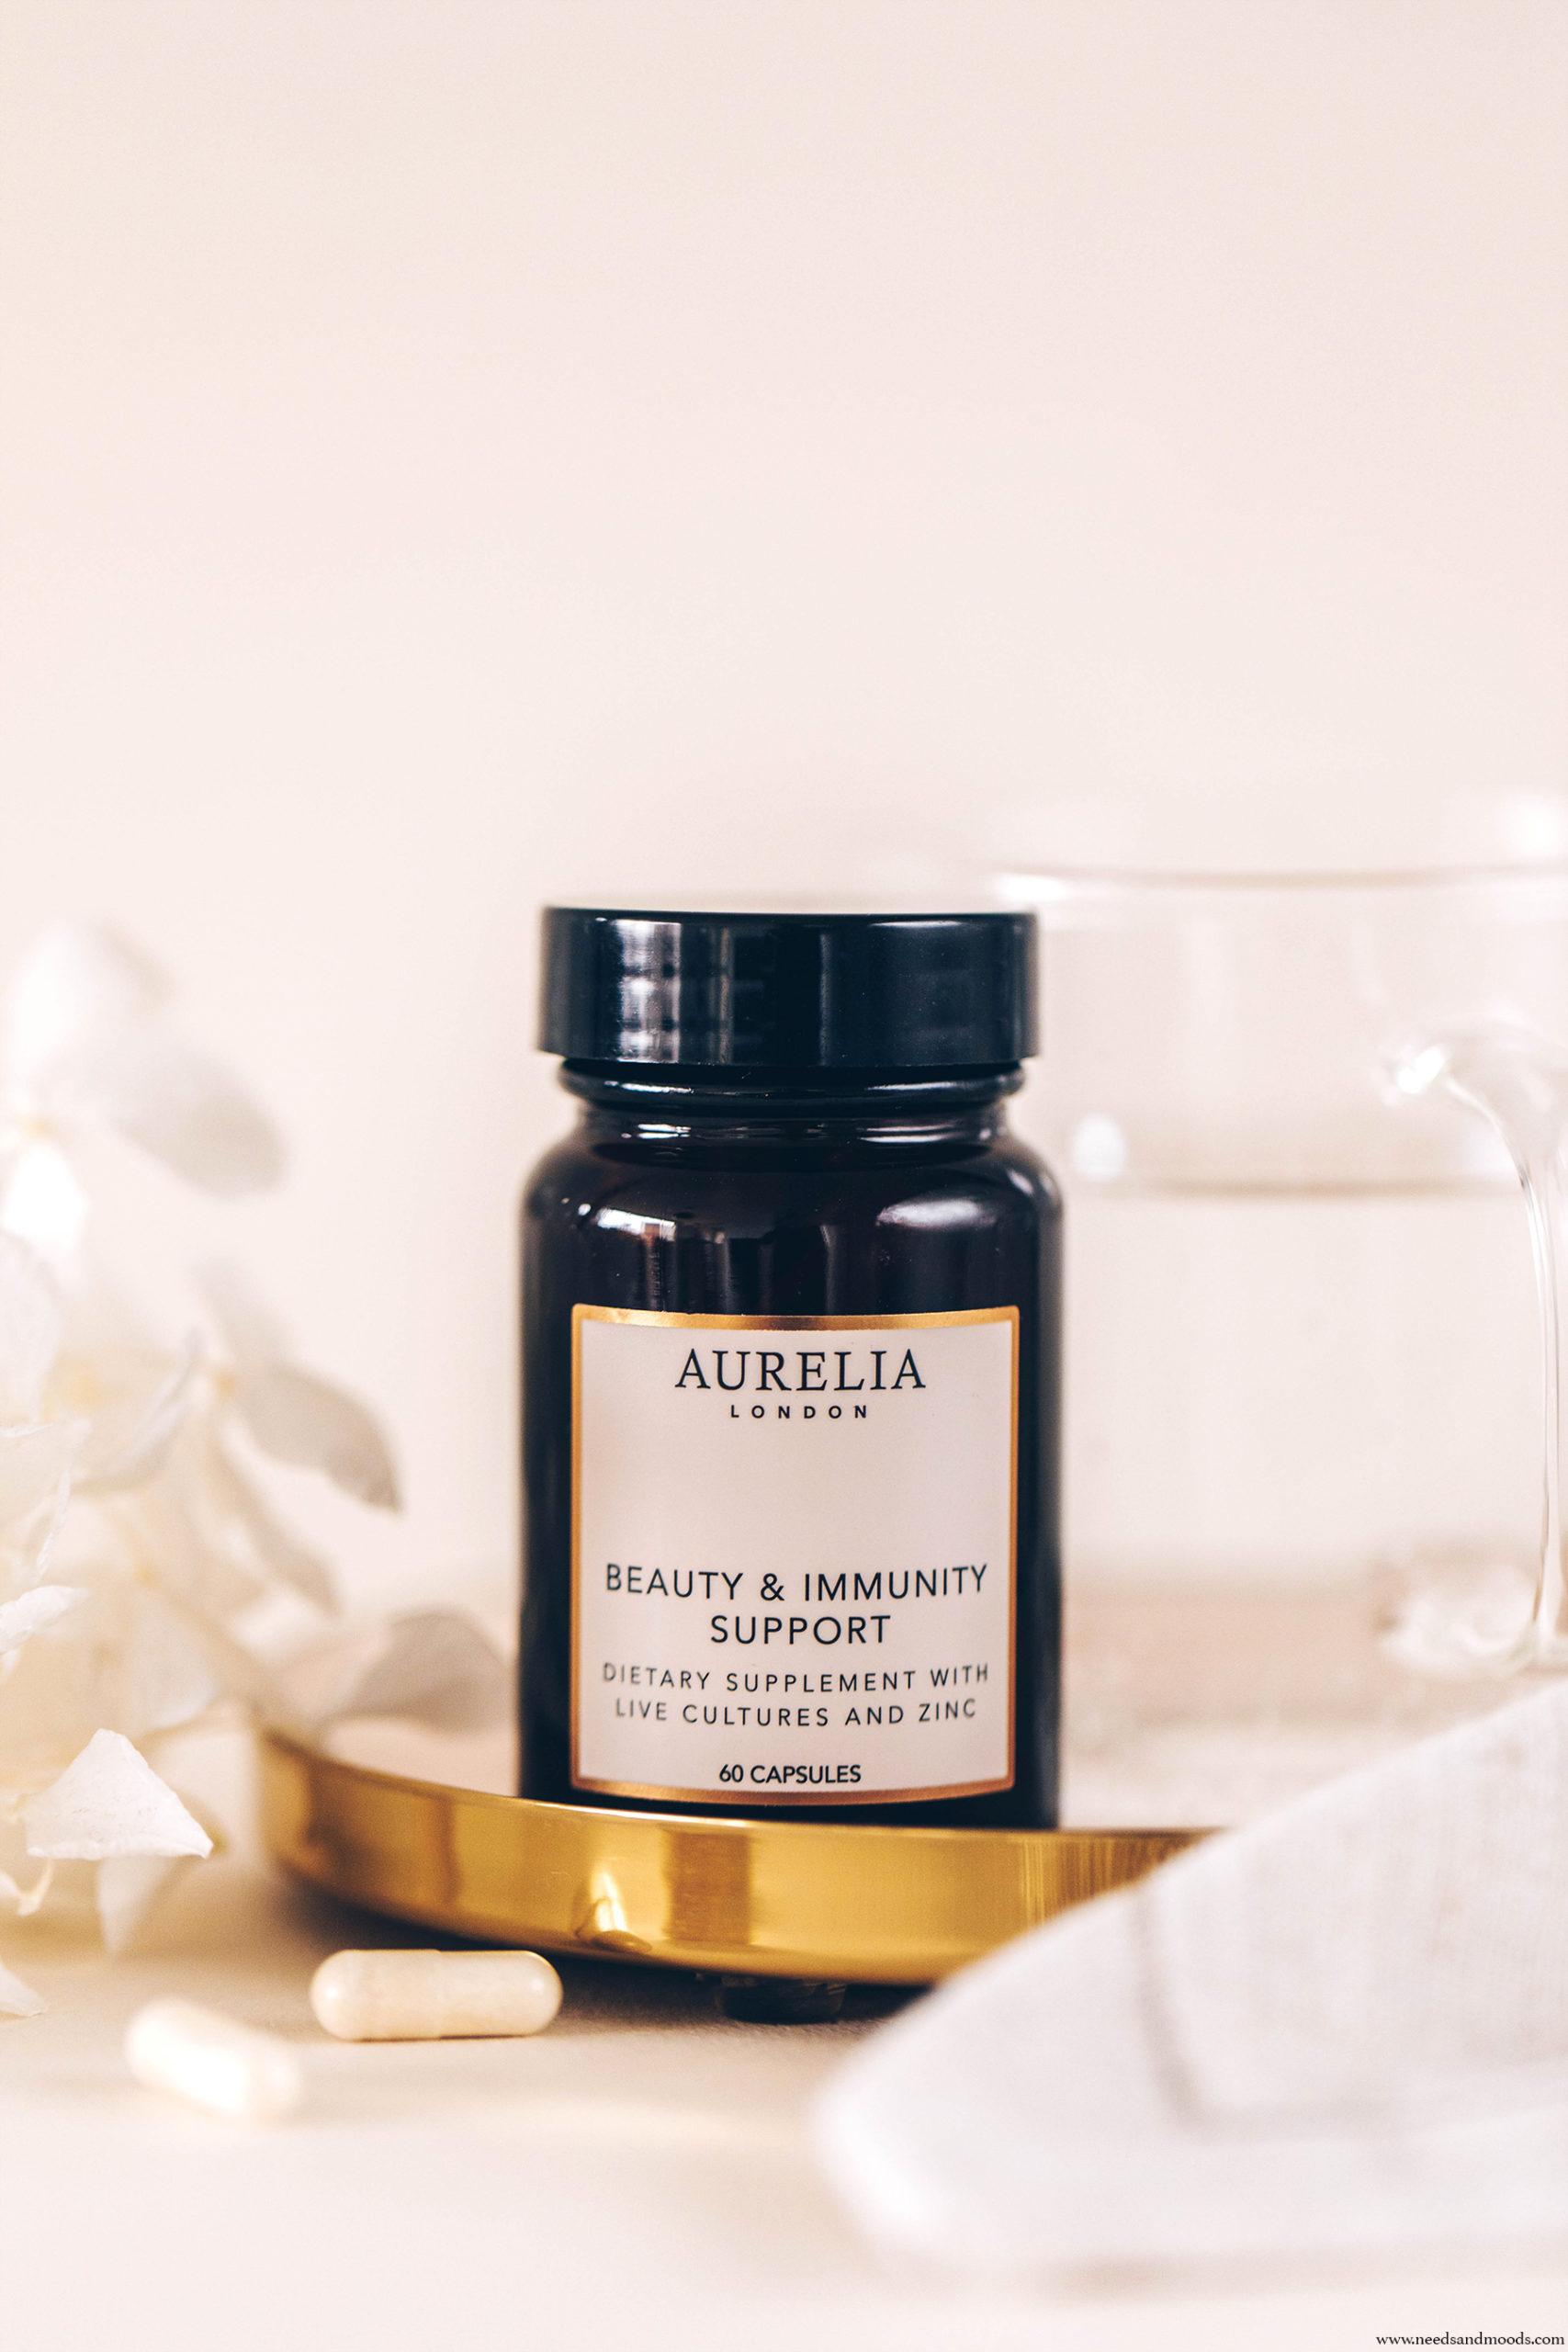 beauty immunity support aurelia london test